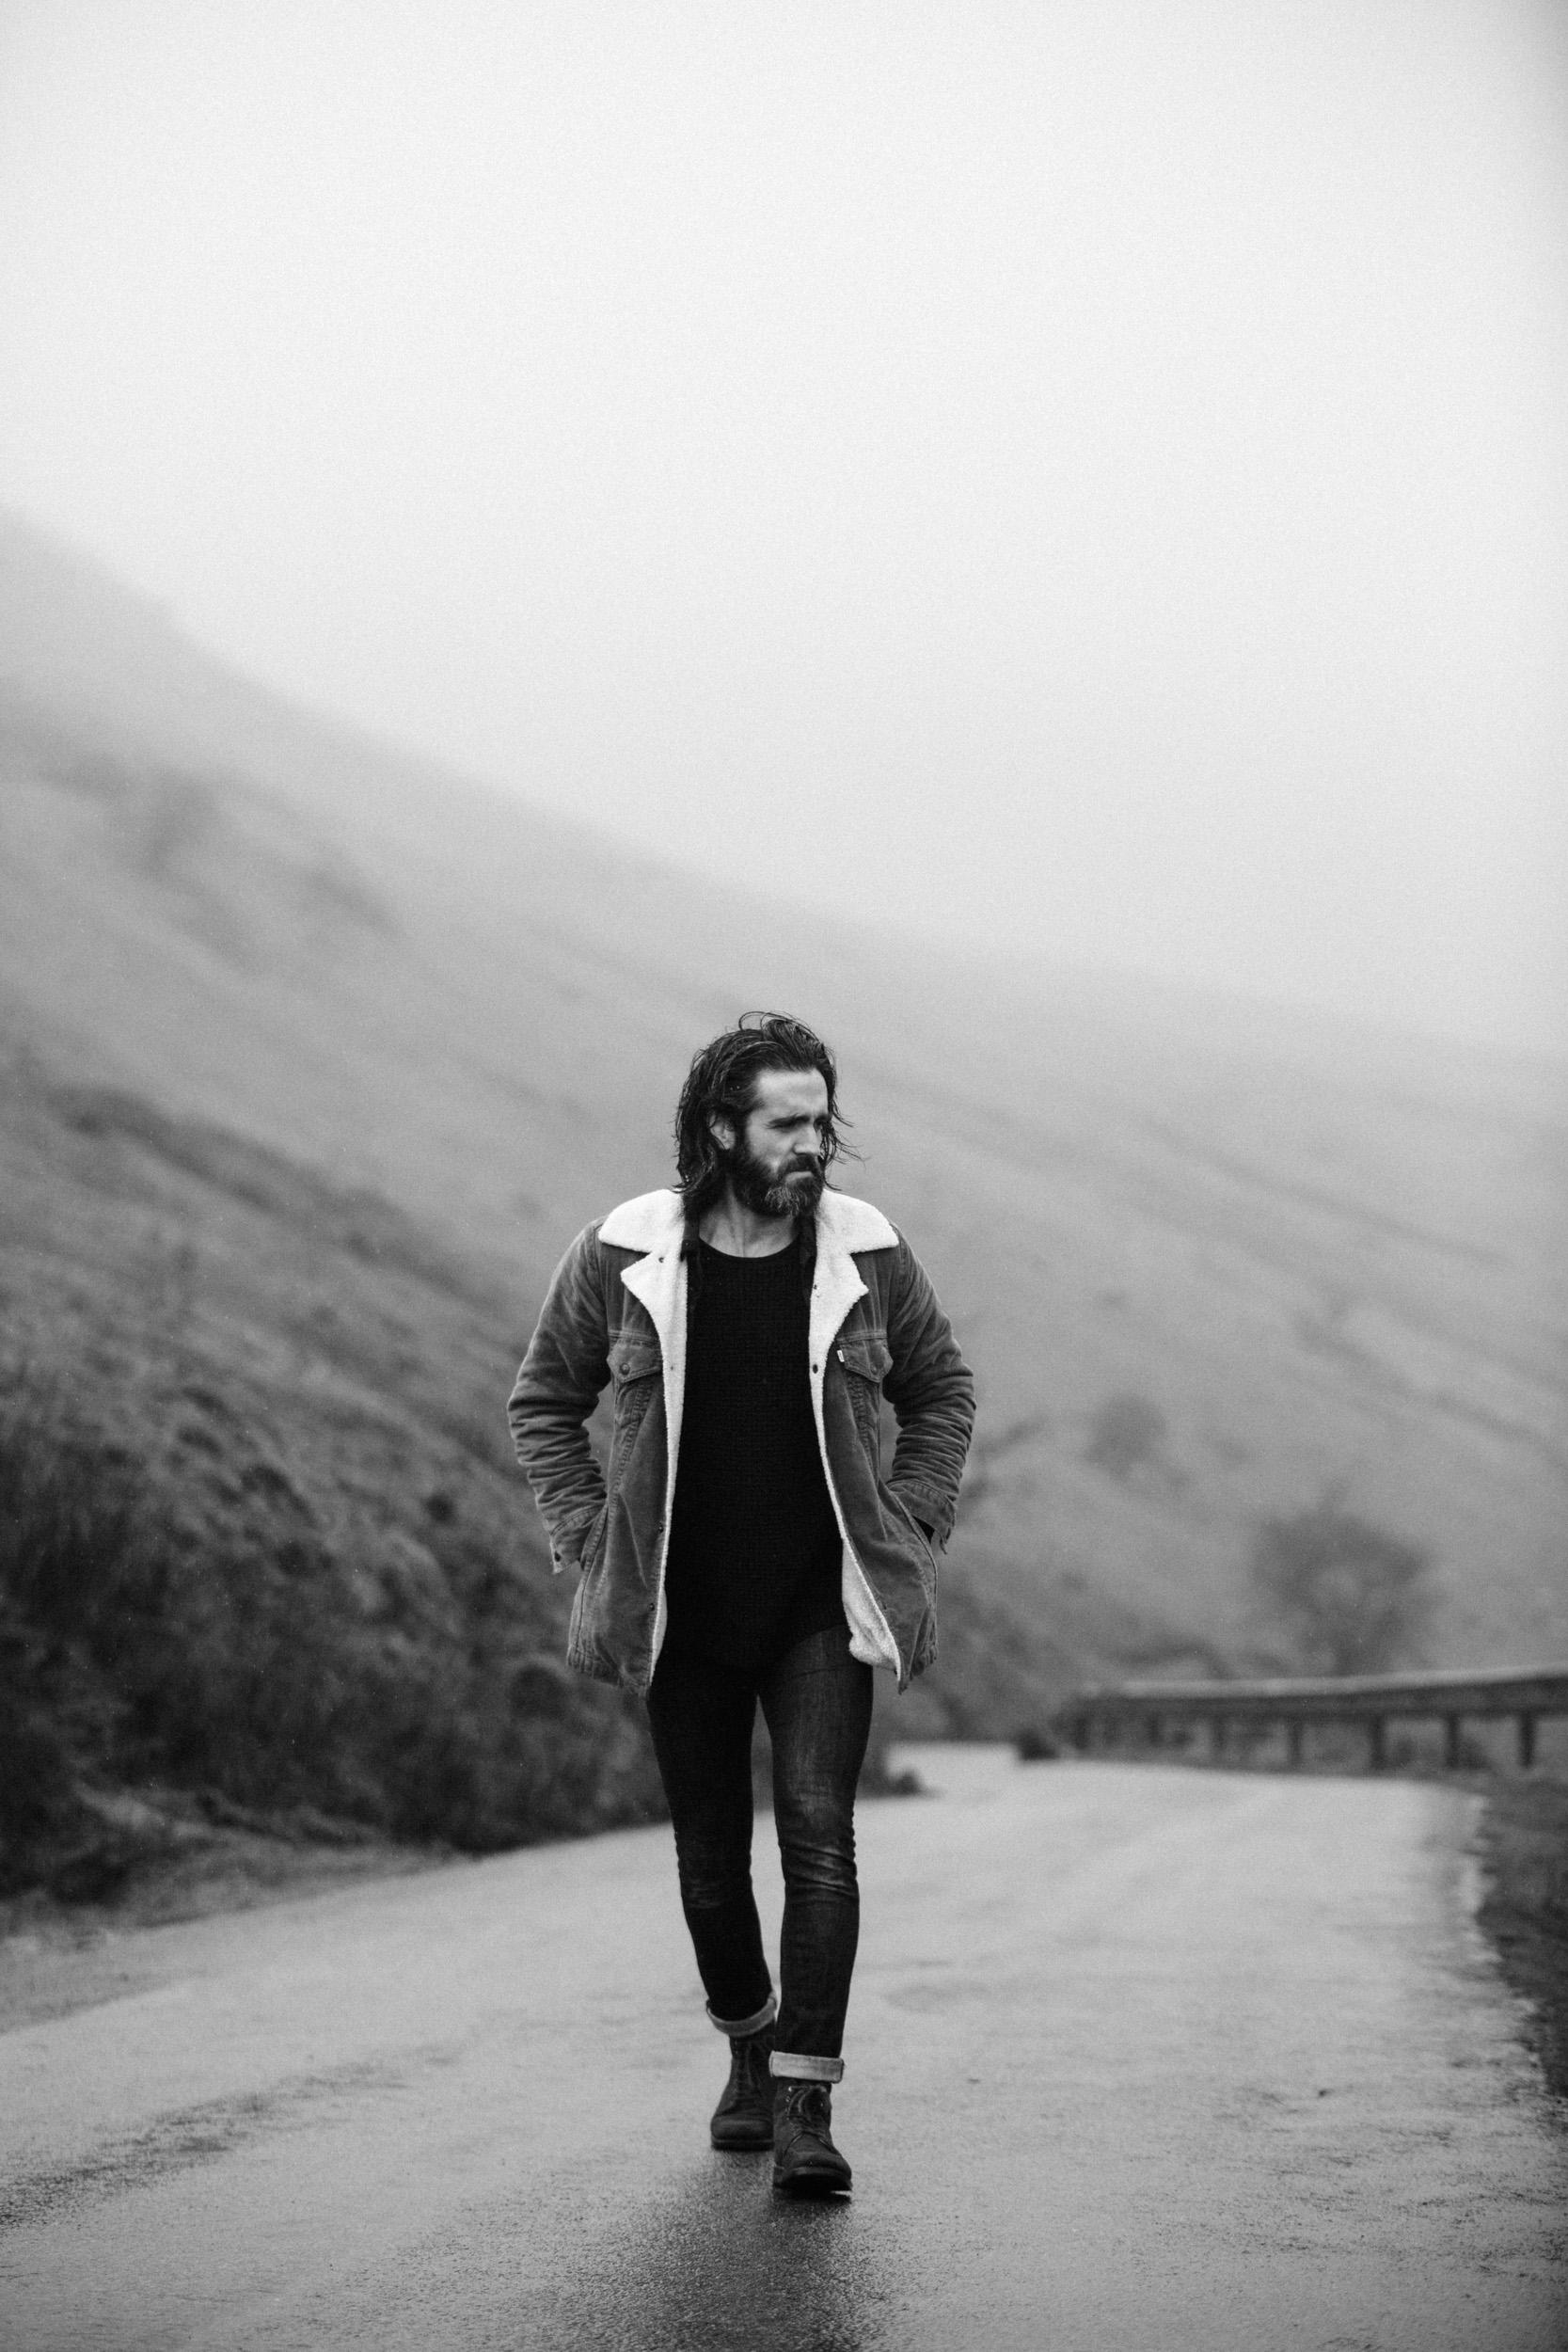 Cardiff Photographer Alex Sedgmond - Photography South Wales - Model Photography Cardiff south wales-2.jpg